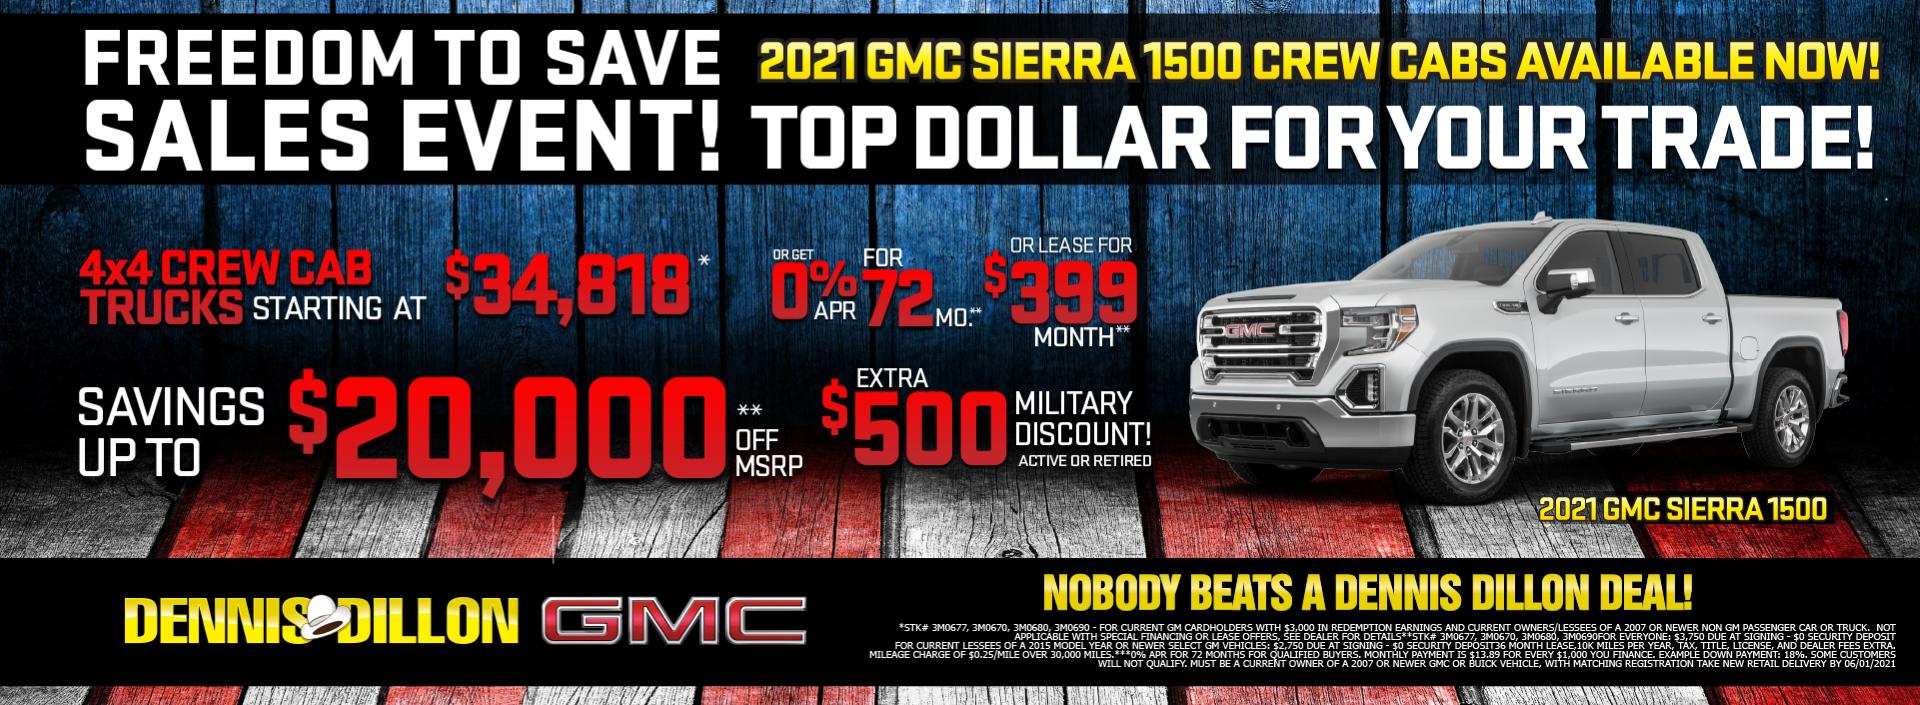 BOI 210506 Sierra GMC Banners 1920×705 Web Banner copy2